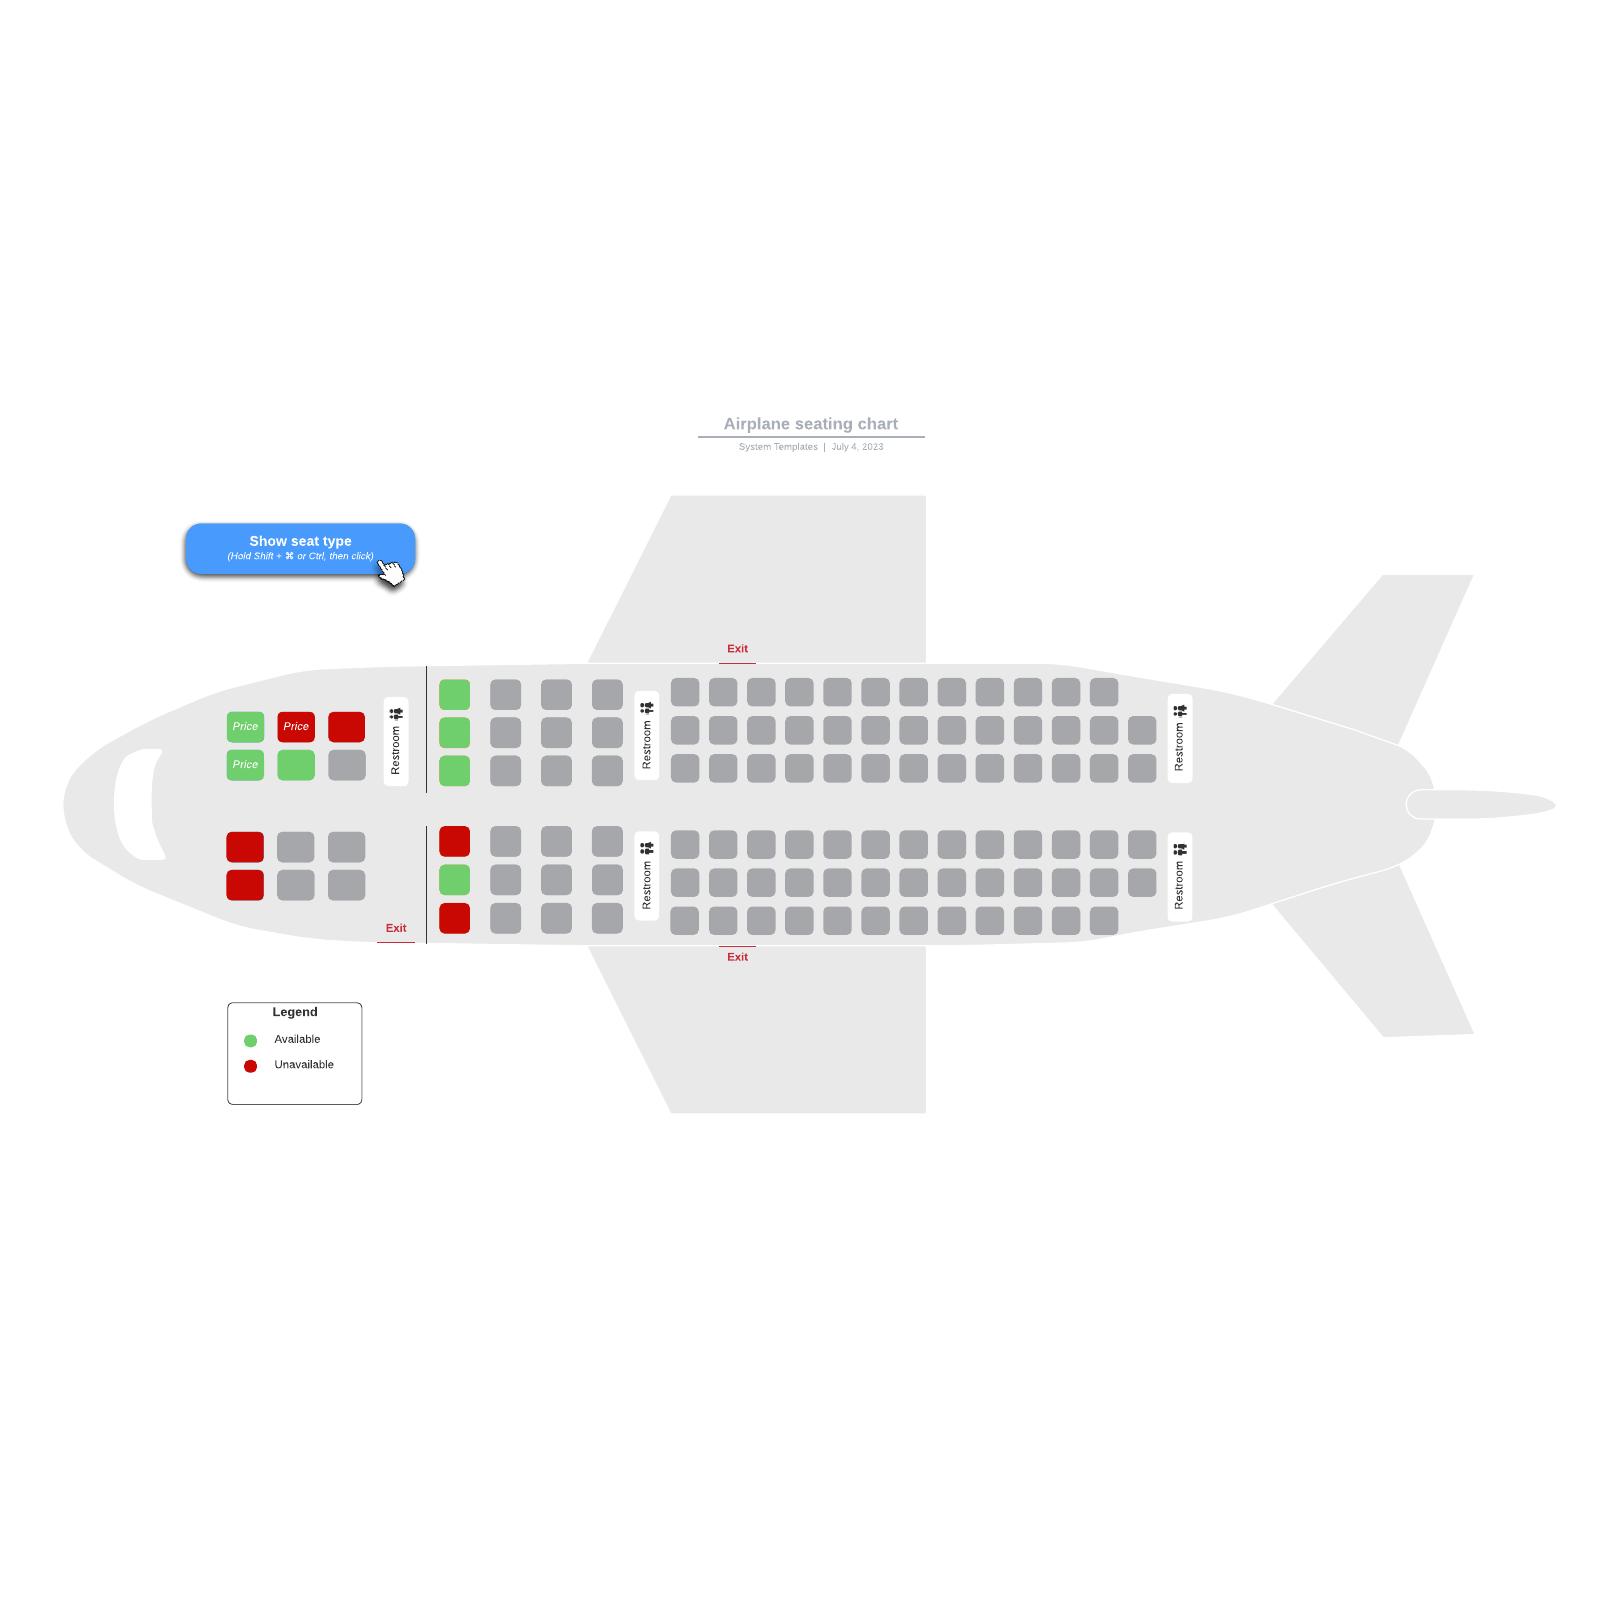 Airplane seating chart